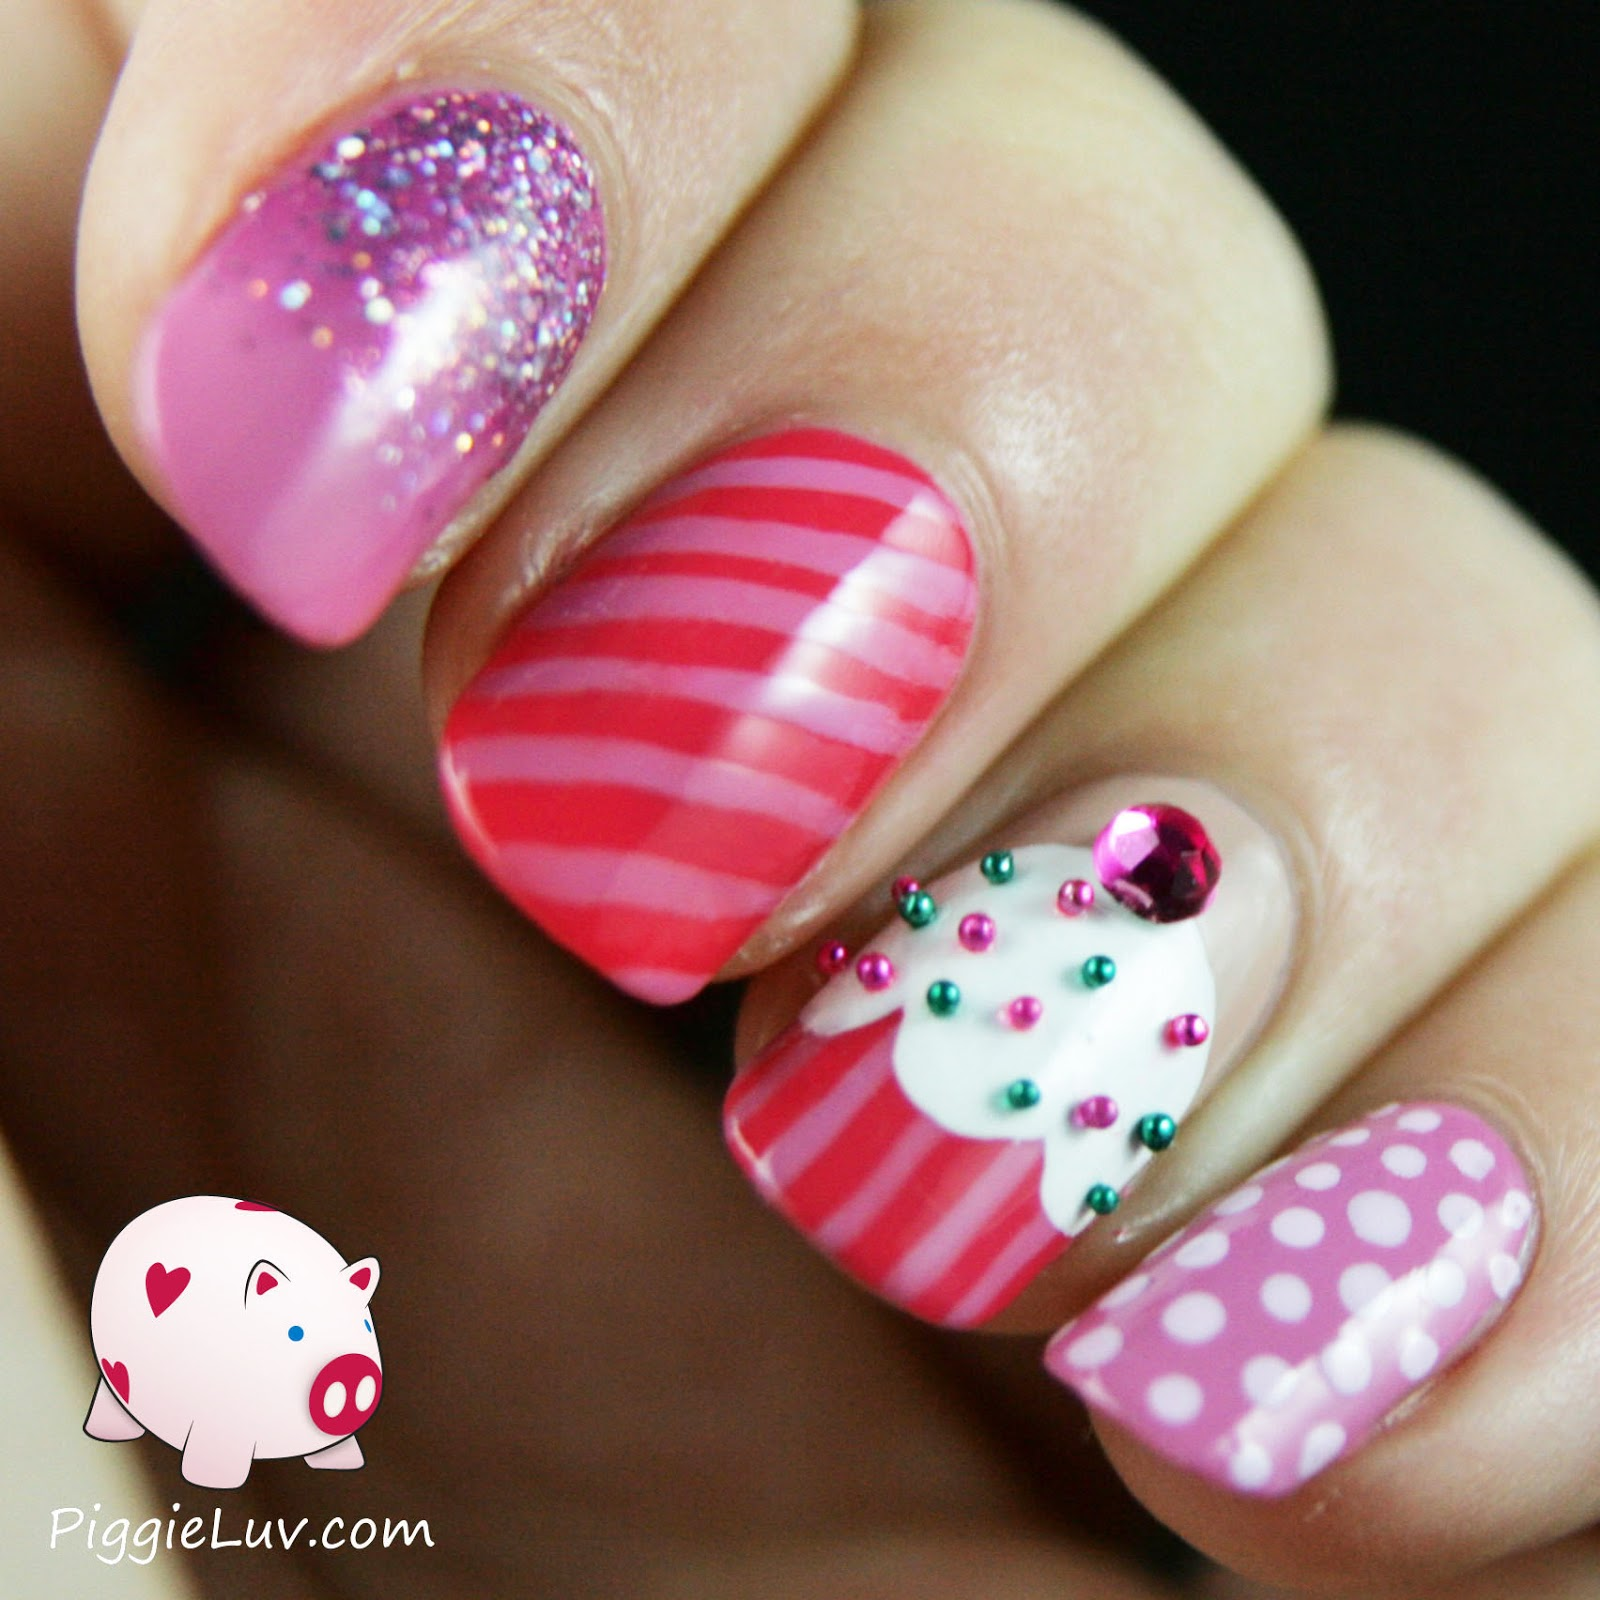 Cupcake Nails: PiggieLuv: Cupcake Nail Art , Very Tasty